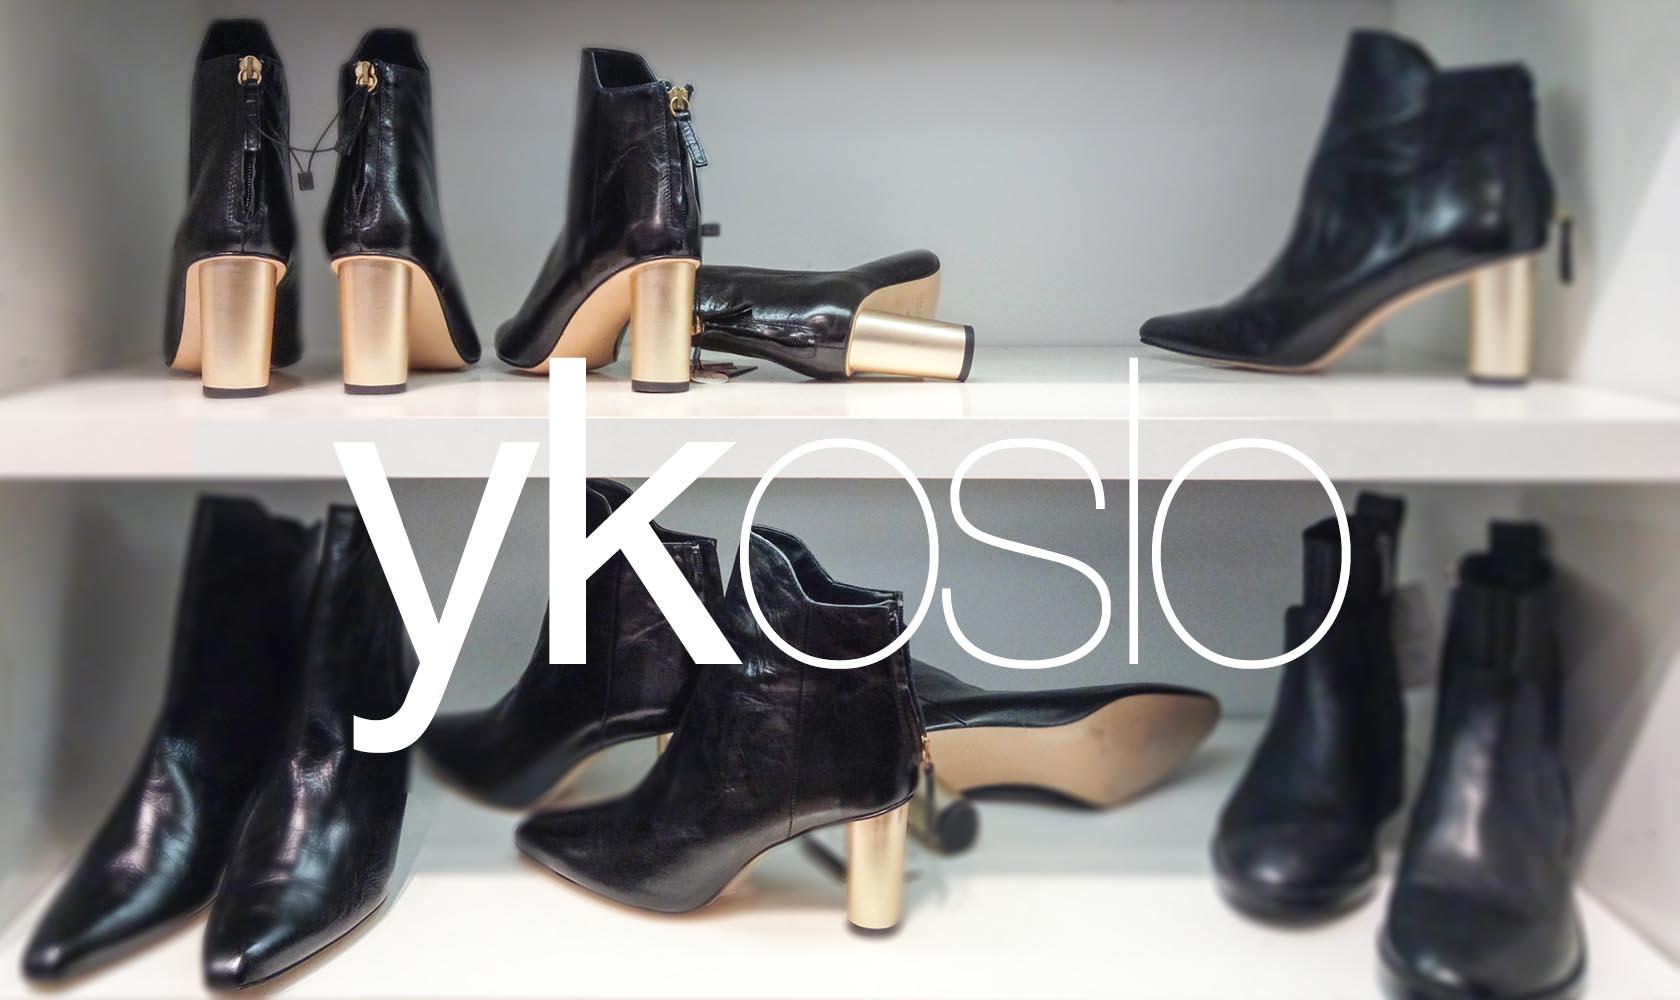 ykoslo__6